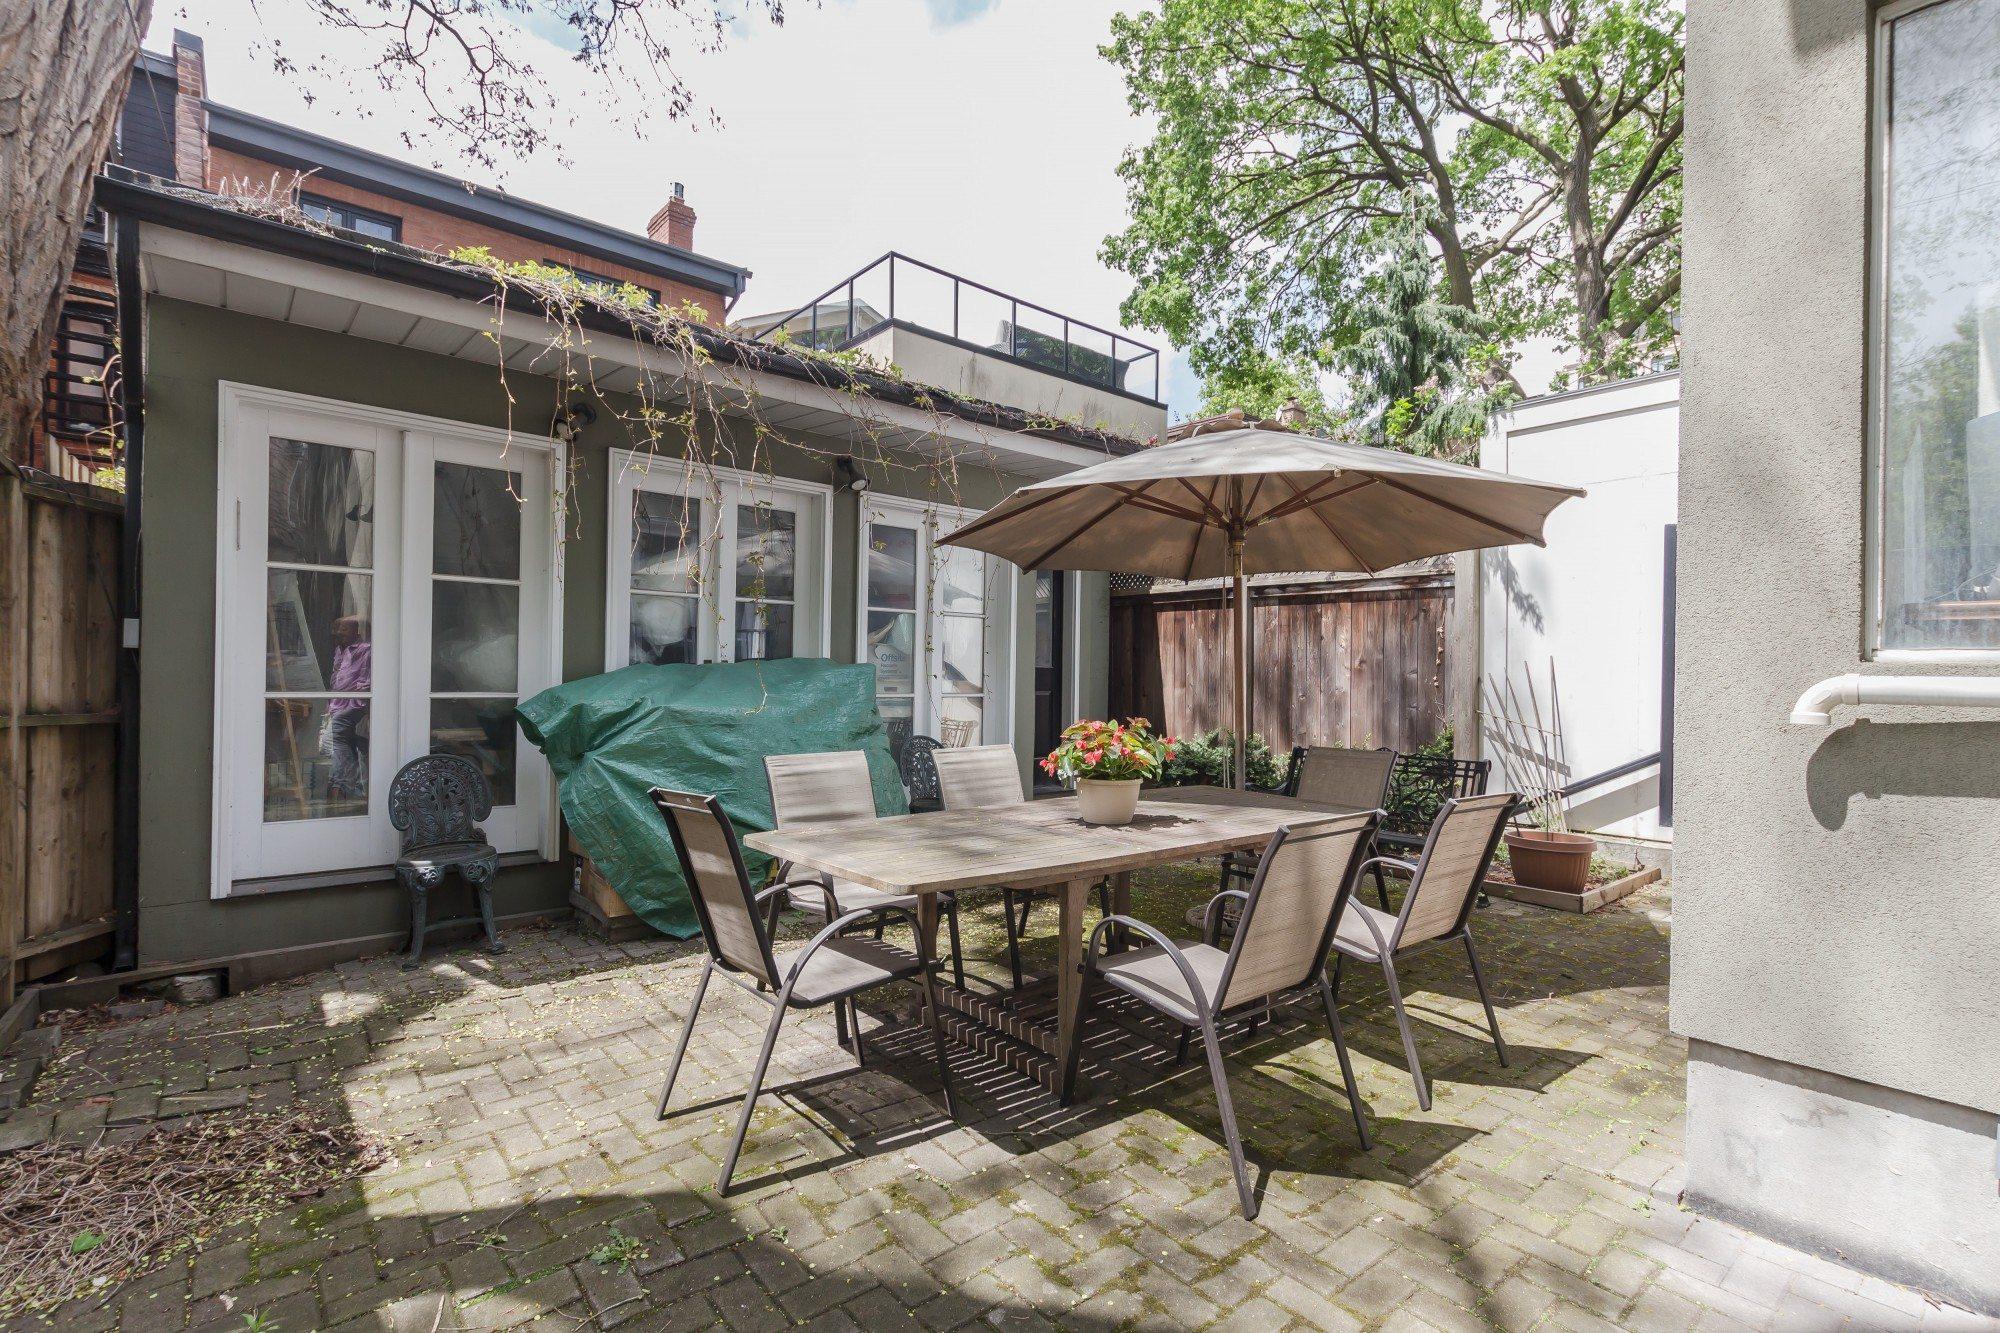 toronto-house-sold-21-new-street-7